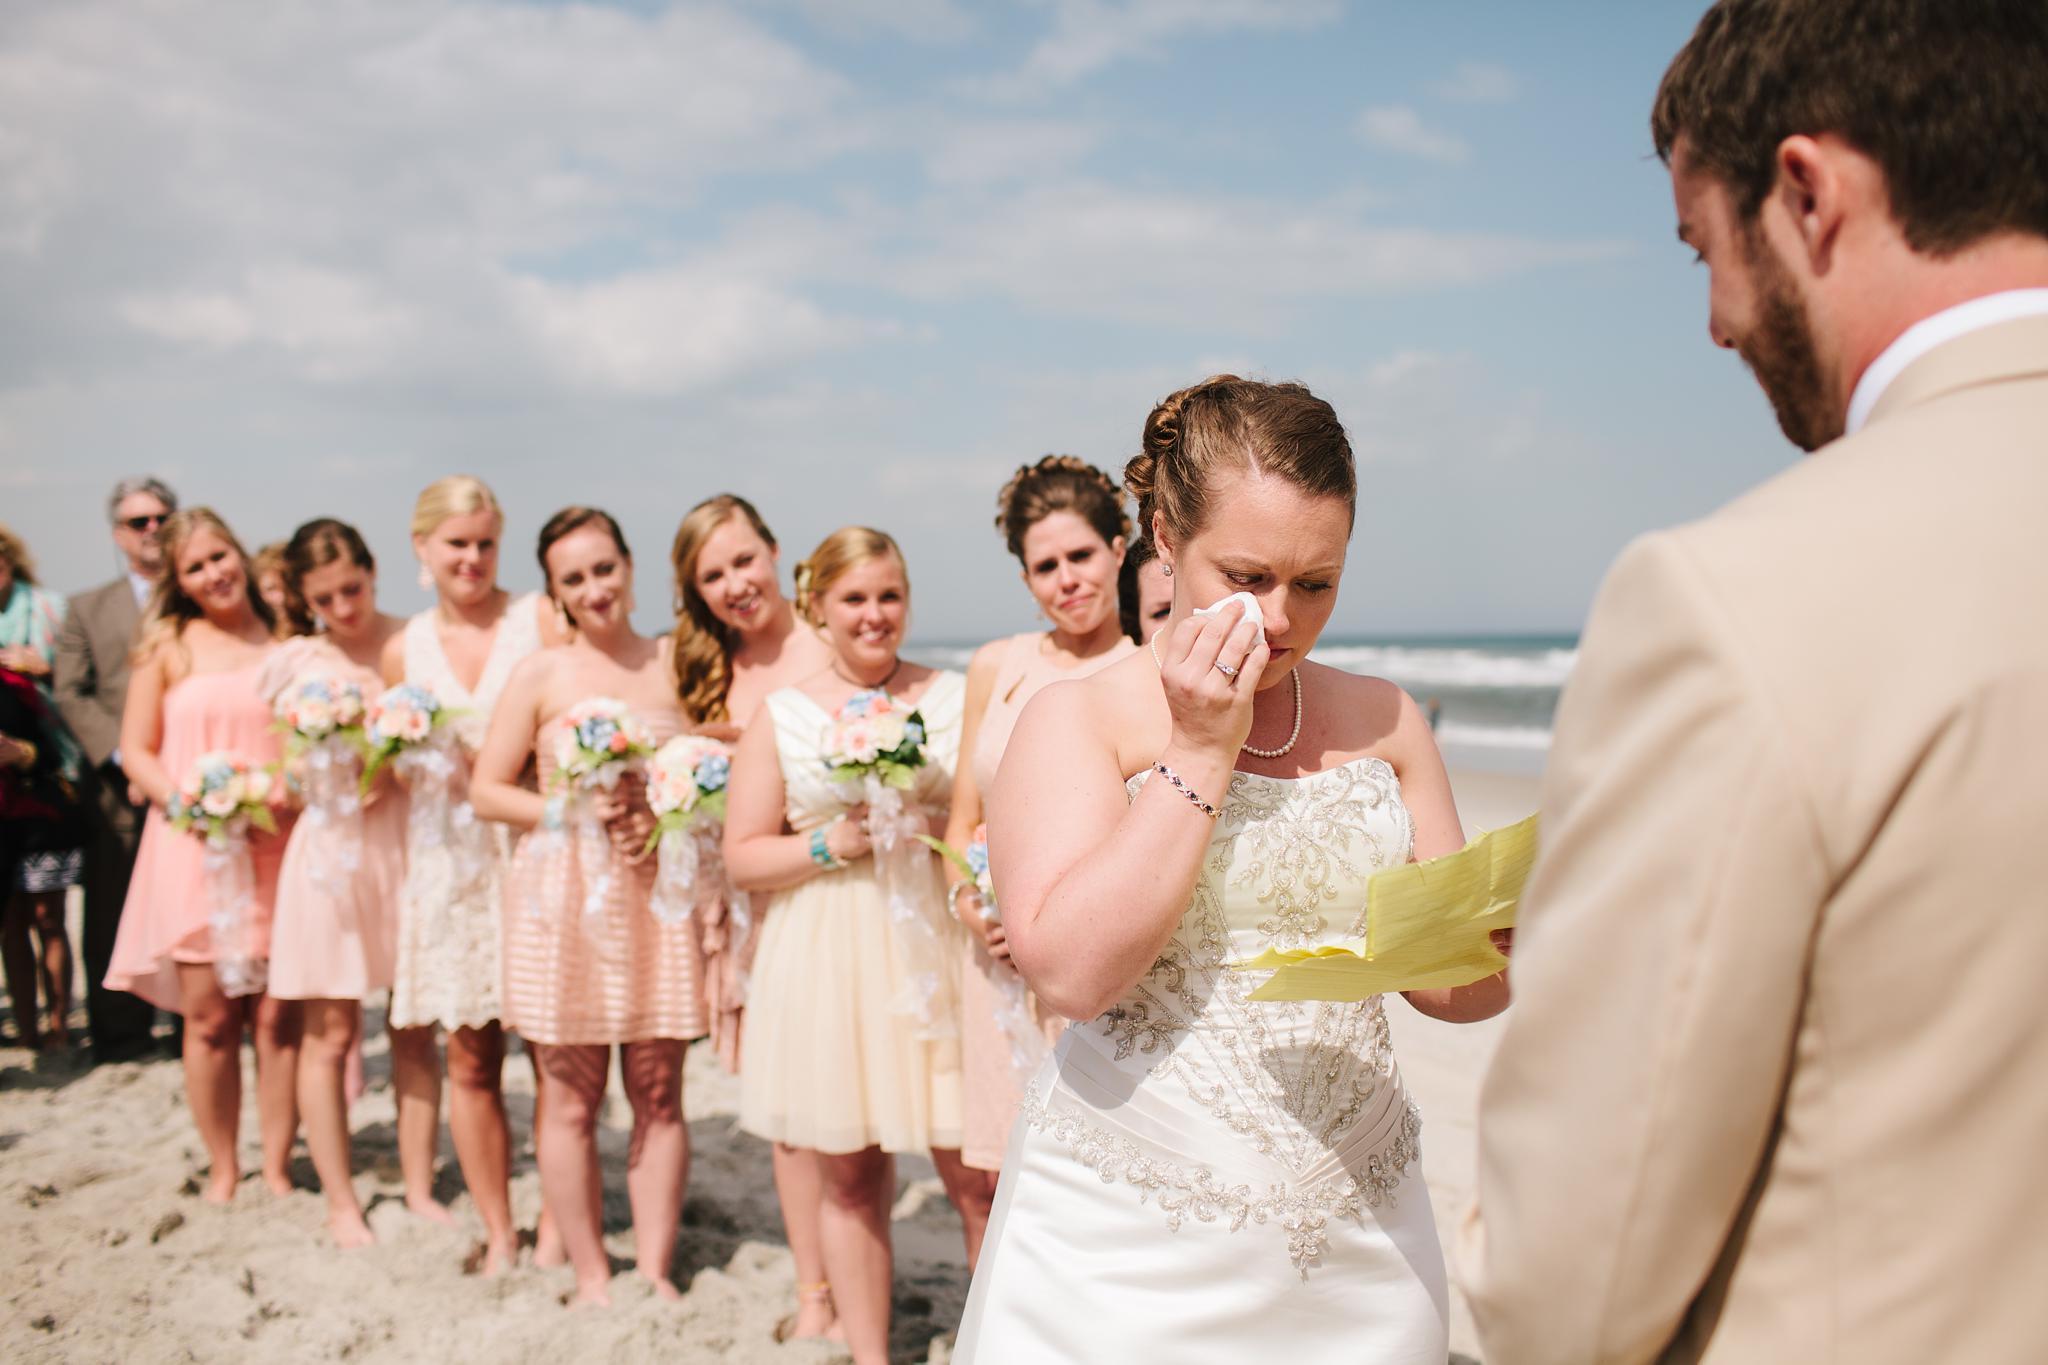 brant_beach_yacht_club_wedding_long_beach_island_nj_wedding_photographer_421.jpg